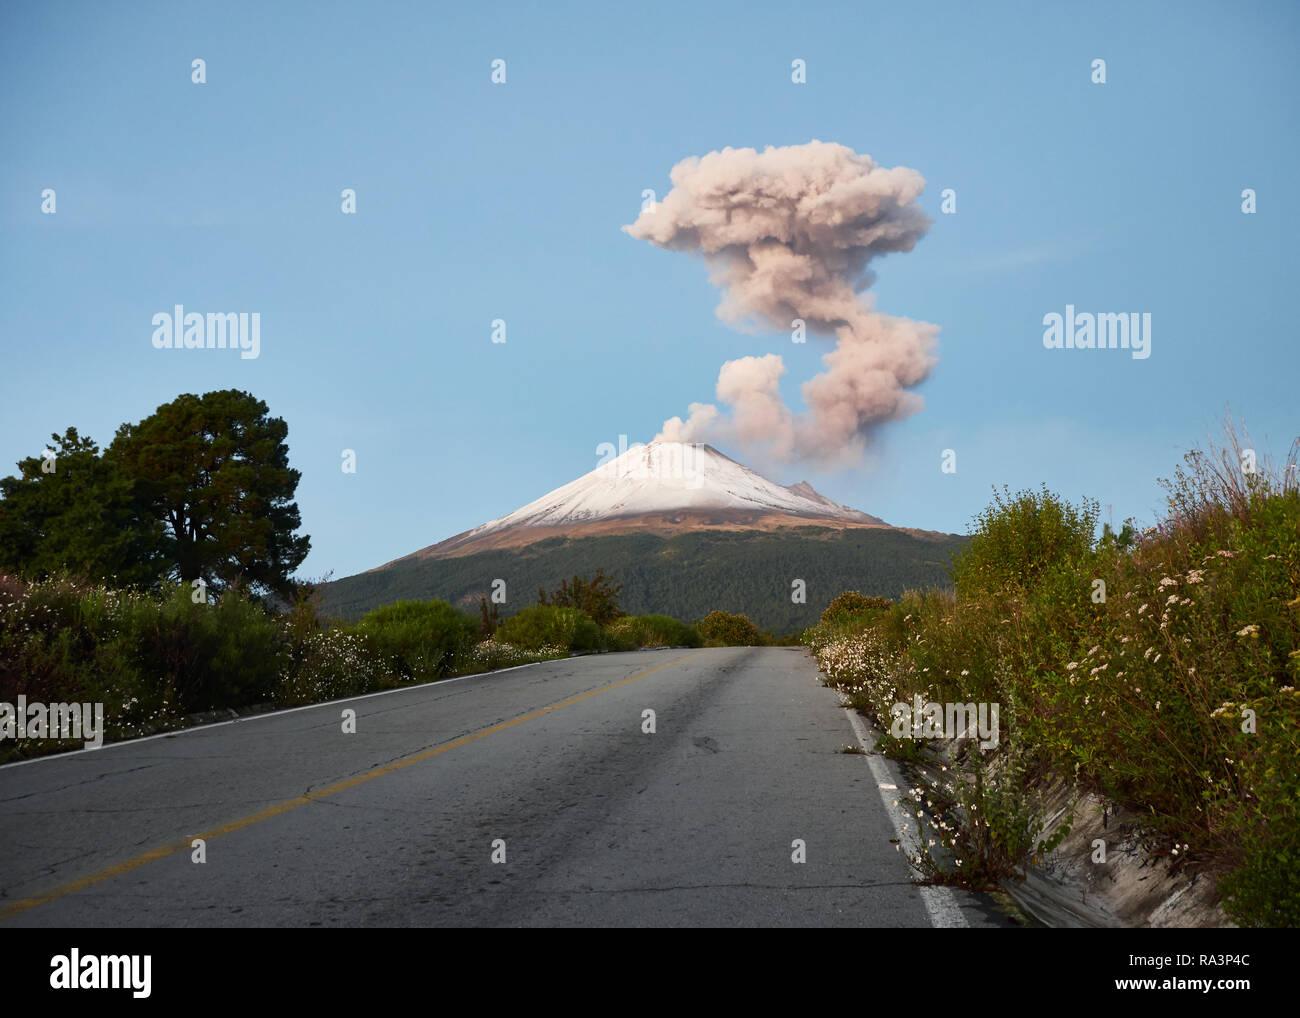 Fumaroles on Popocatepetl volcano seen from the street Ruta de Evacuación at morning - Stock Image